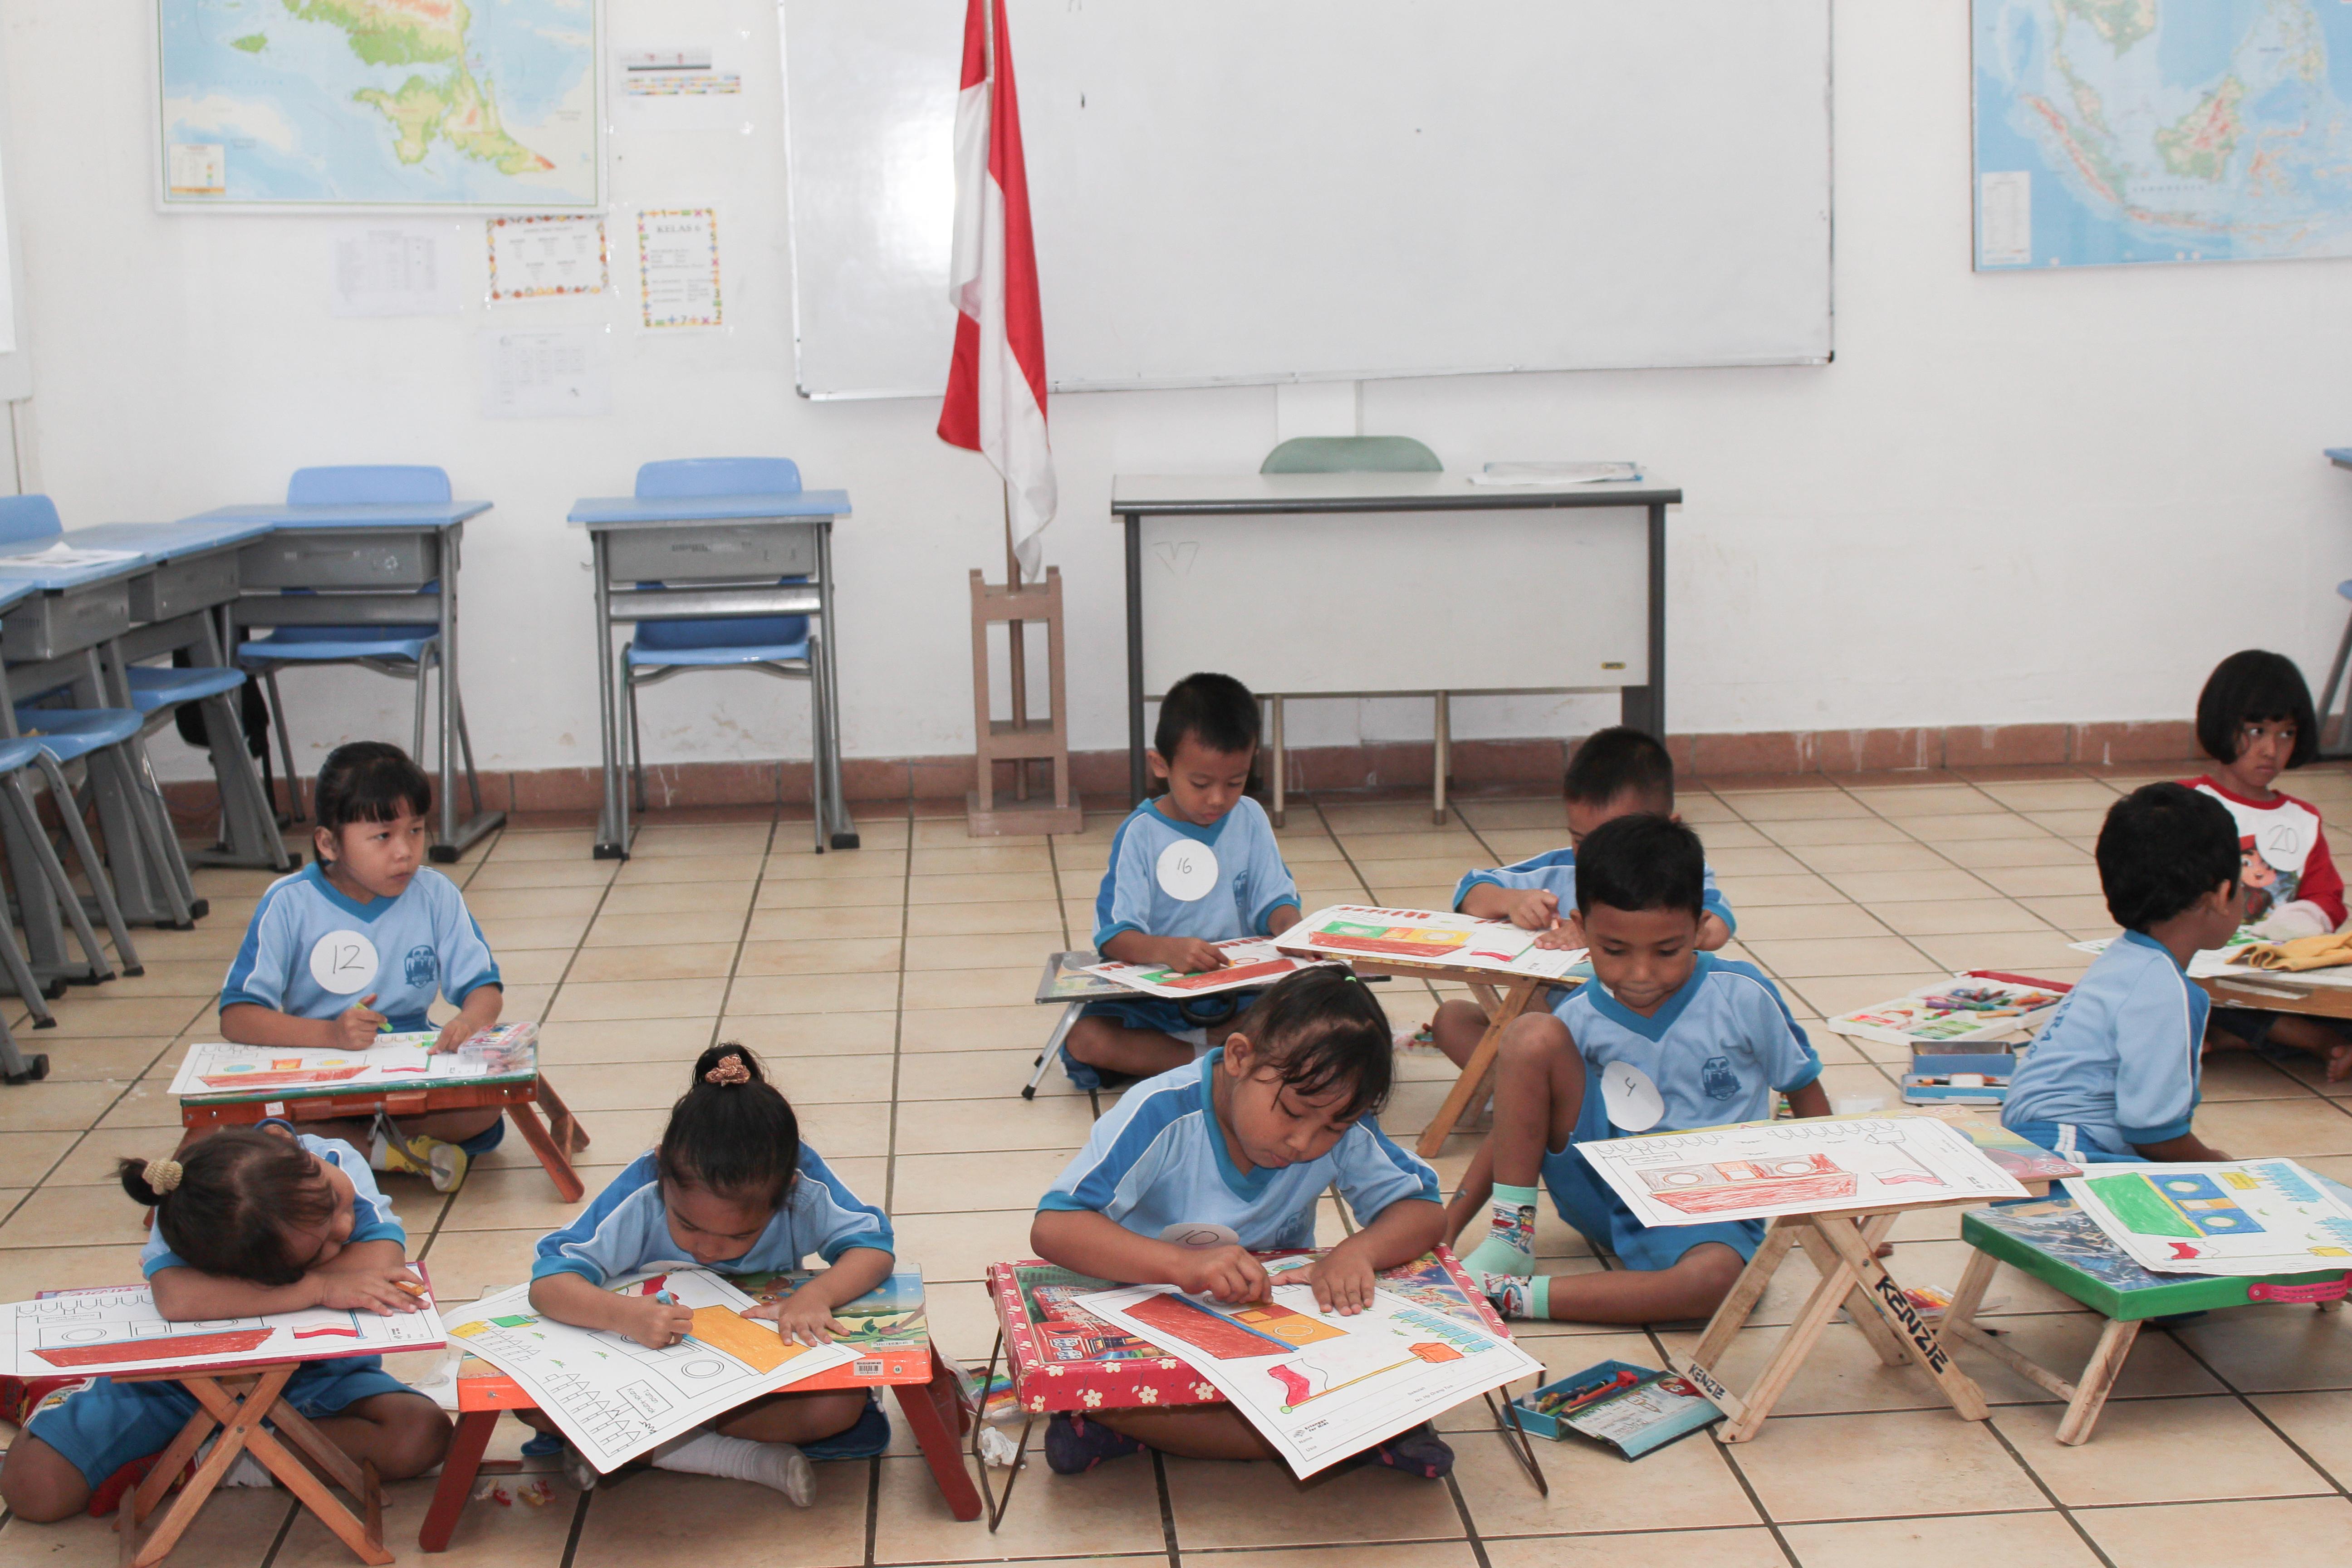 sekolah anak indoensia-sekolah Papua-lomba mewarnai-lomba menggambar_ sekolah papua di sentul